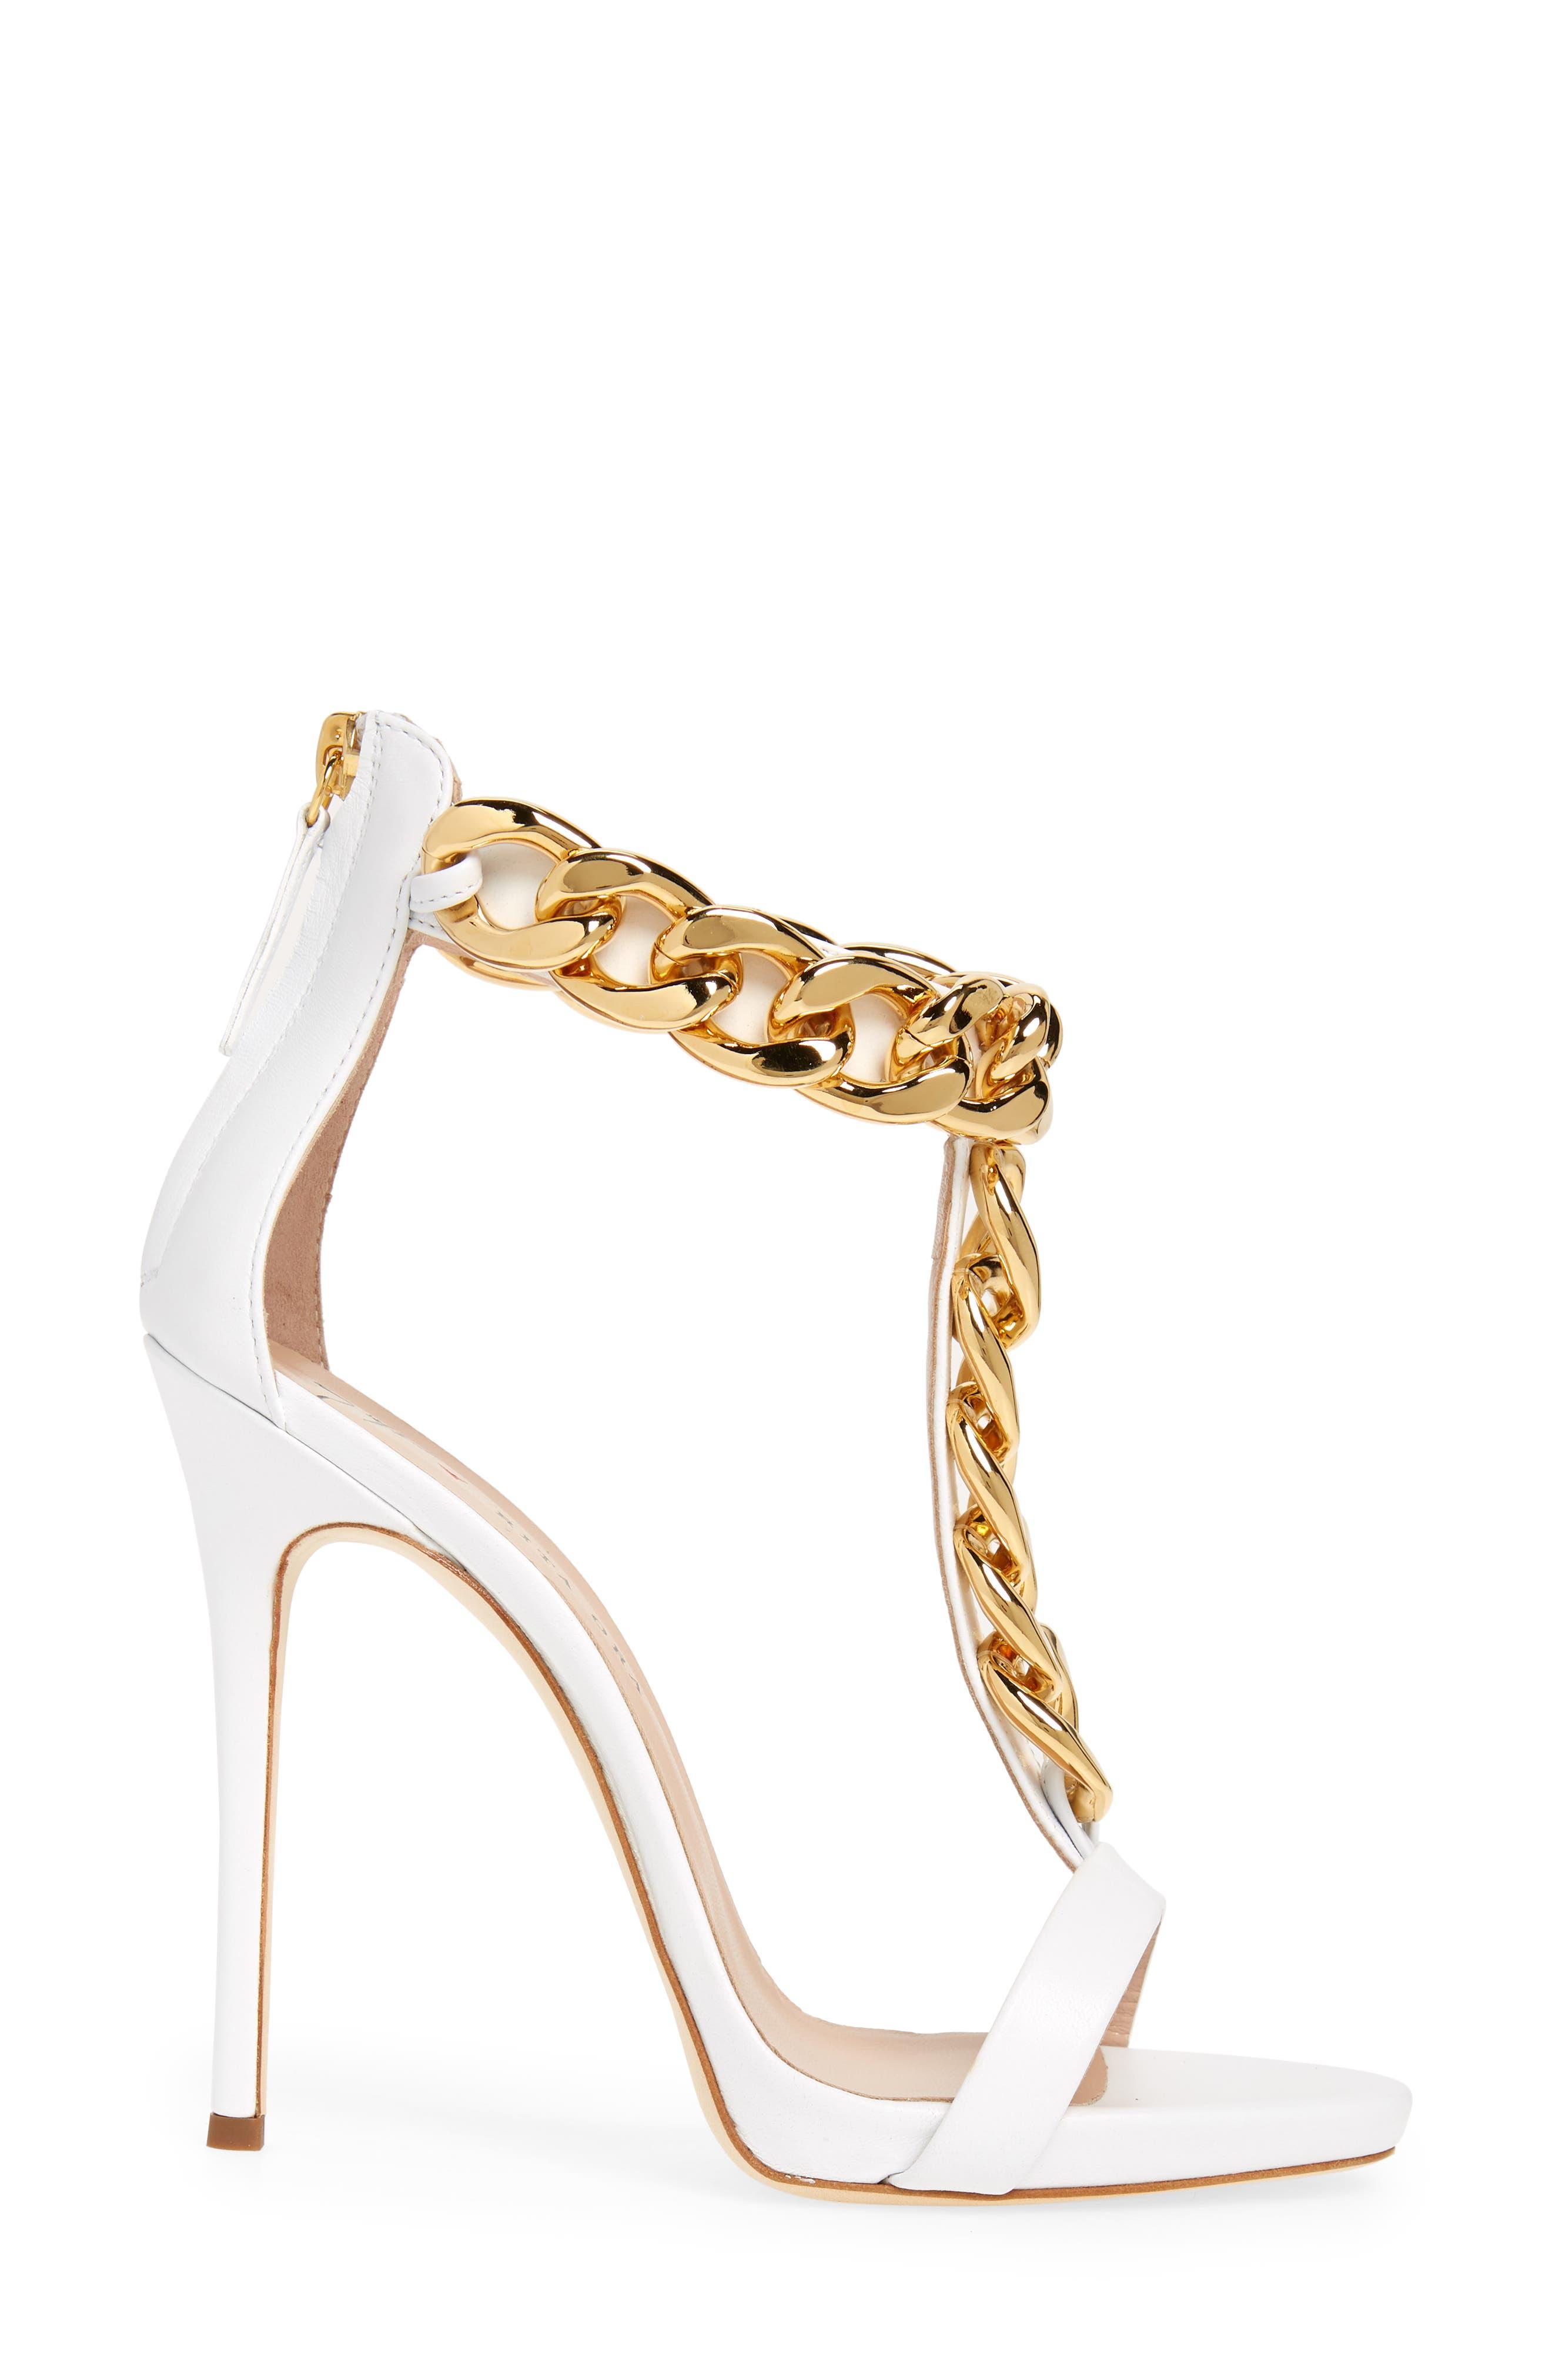 Rita Ora Curb Chain T-Strap Sandal,                             Alternate thumbnail 3, color,                             WHITE